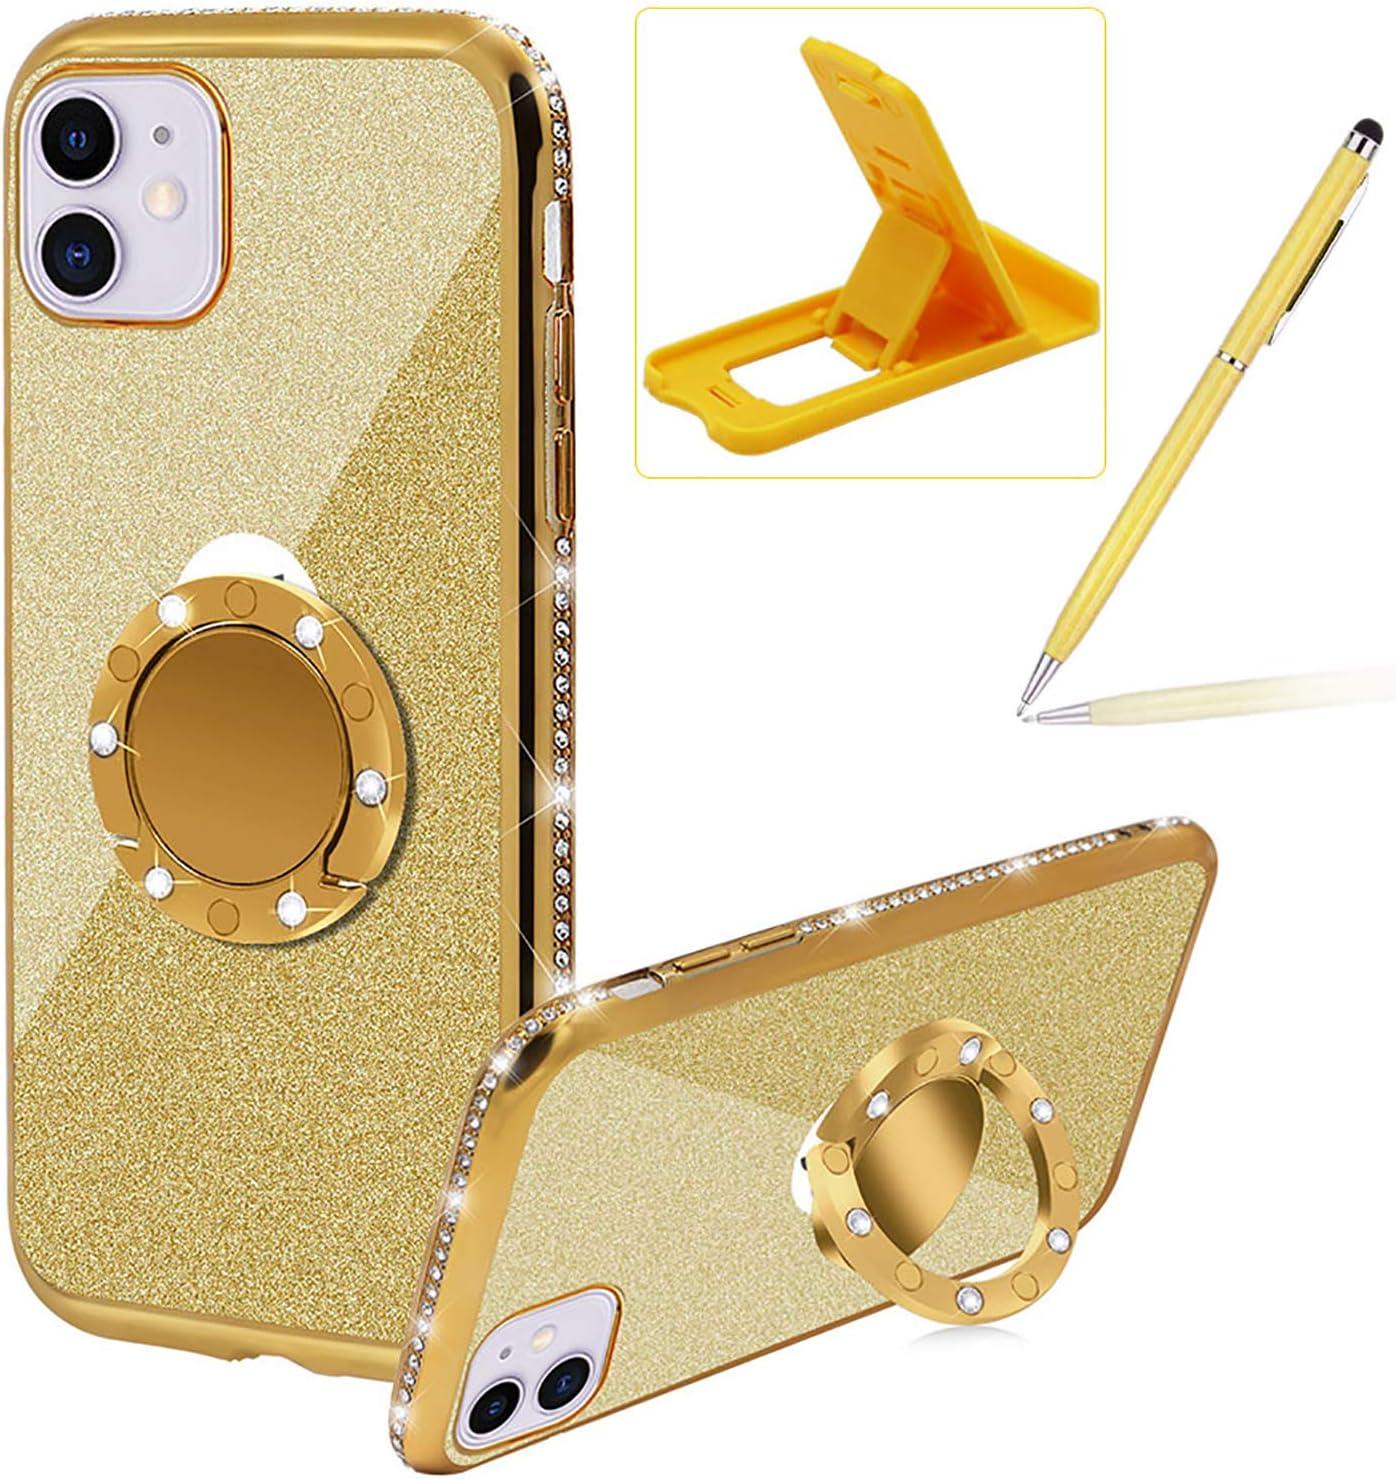 Gold Glitter Genuine Rubber Case for iPhone Herzzer 12 5.4